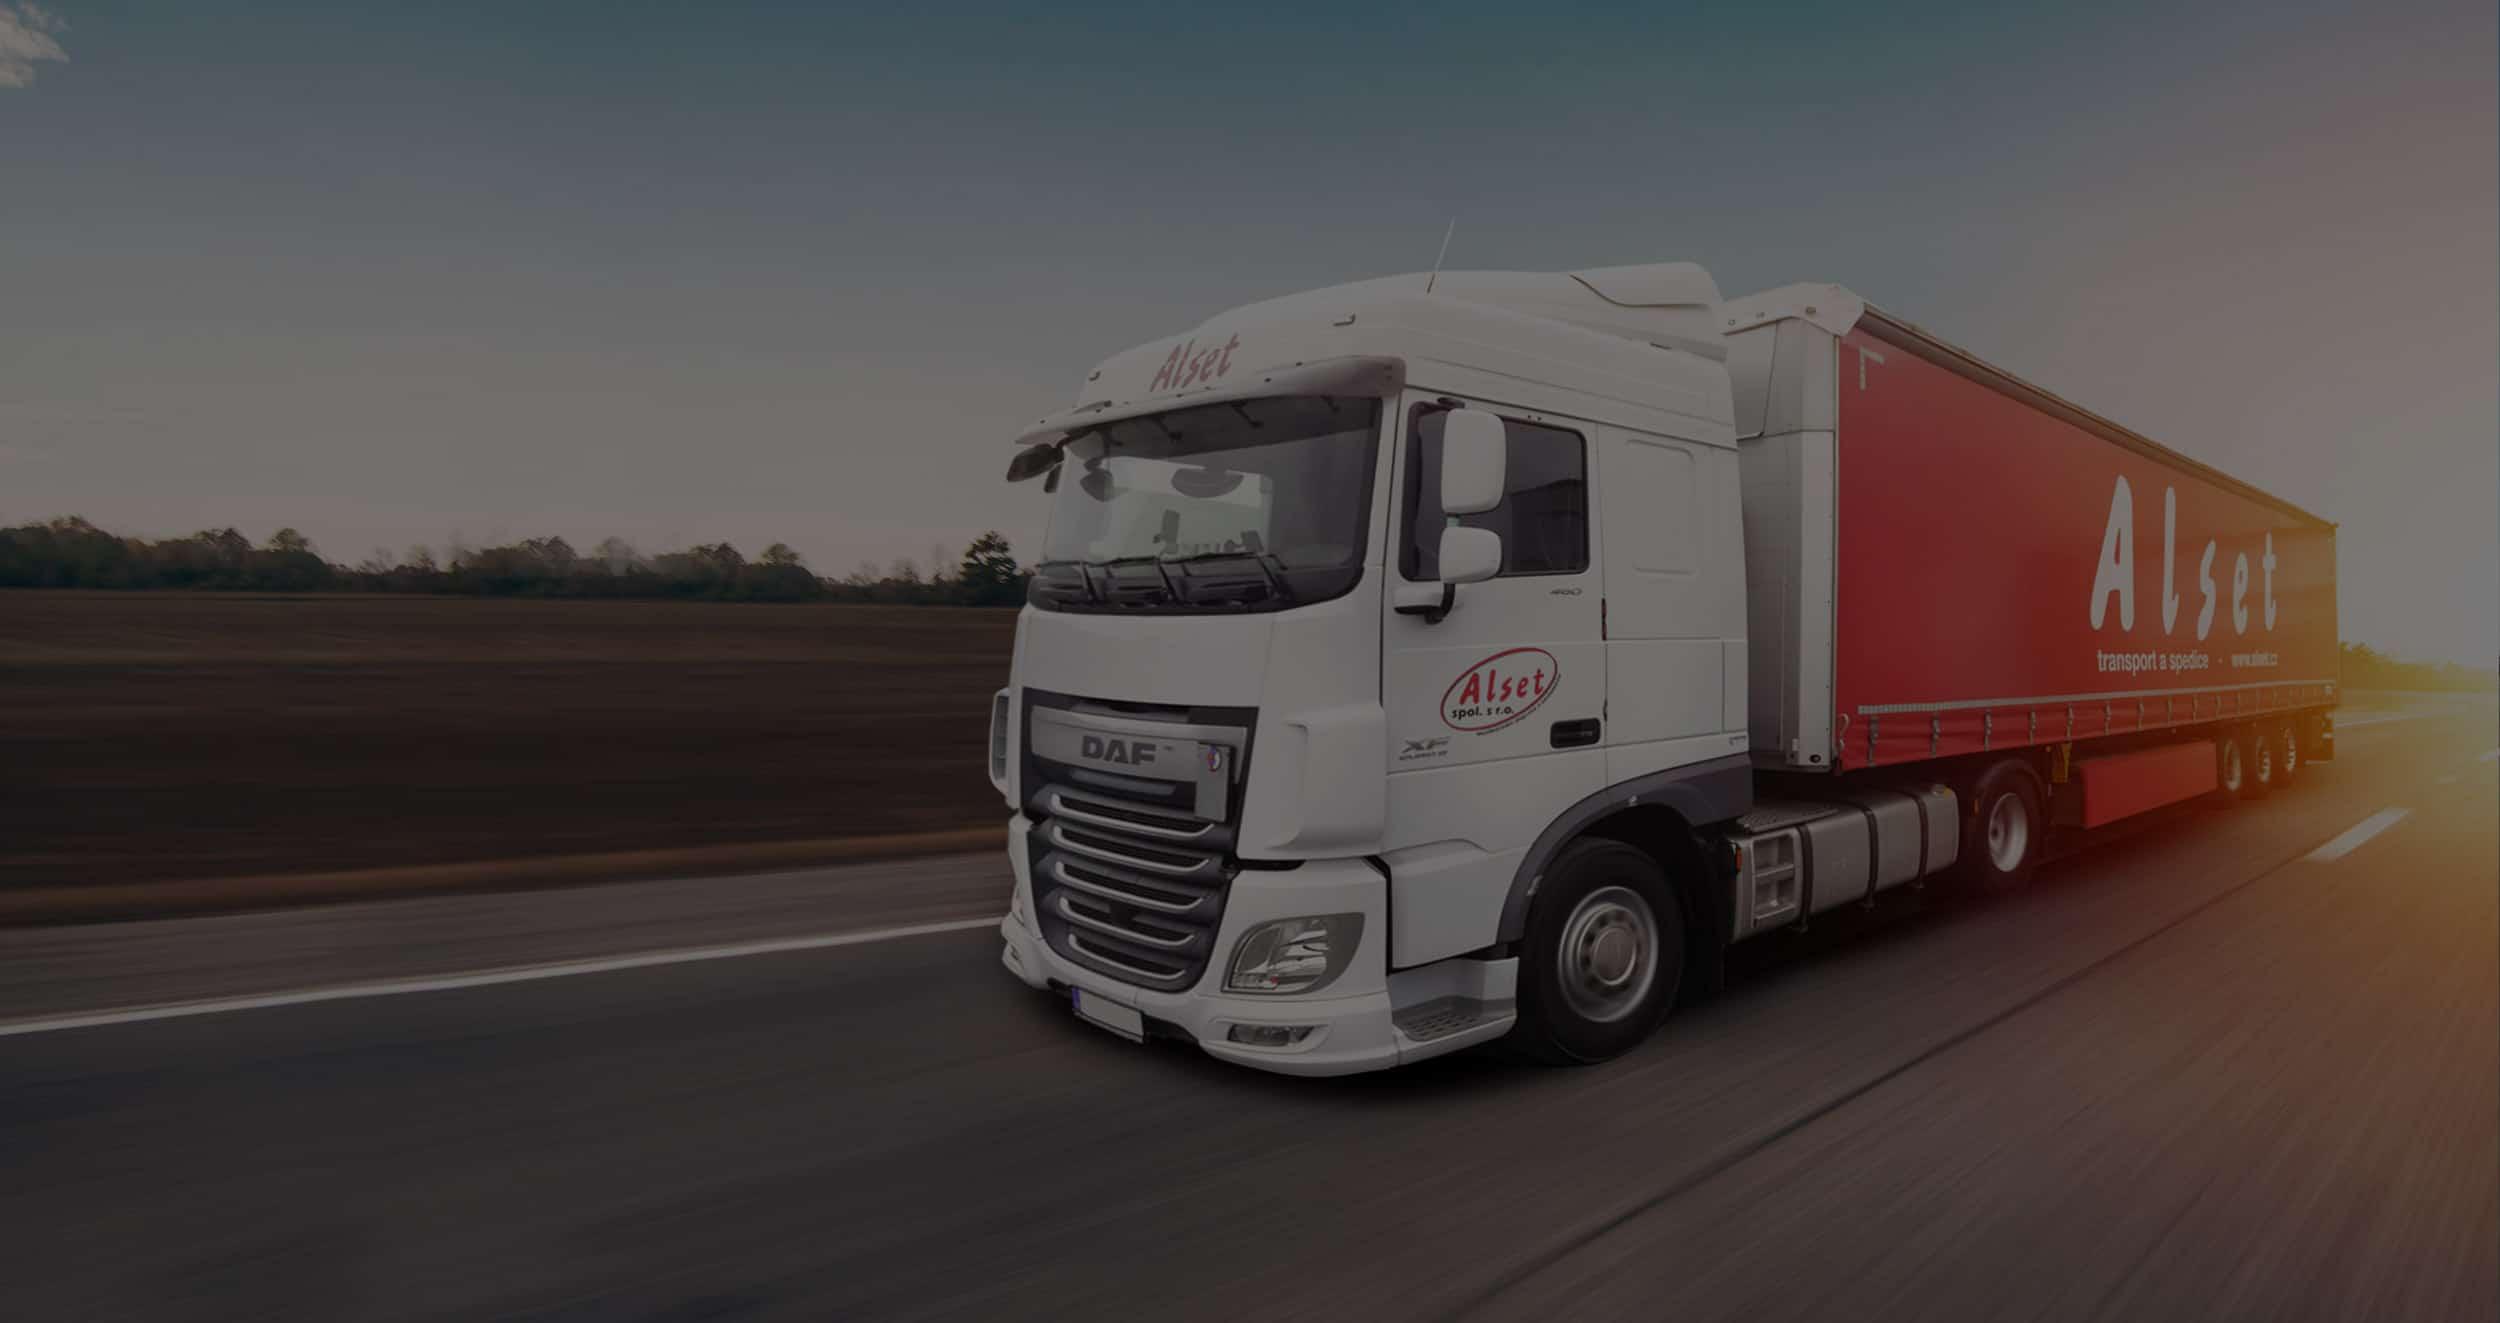 Alset kamion